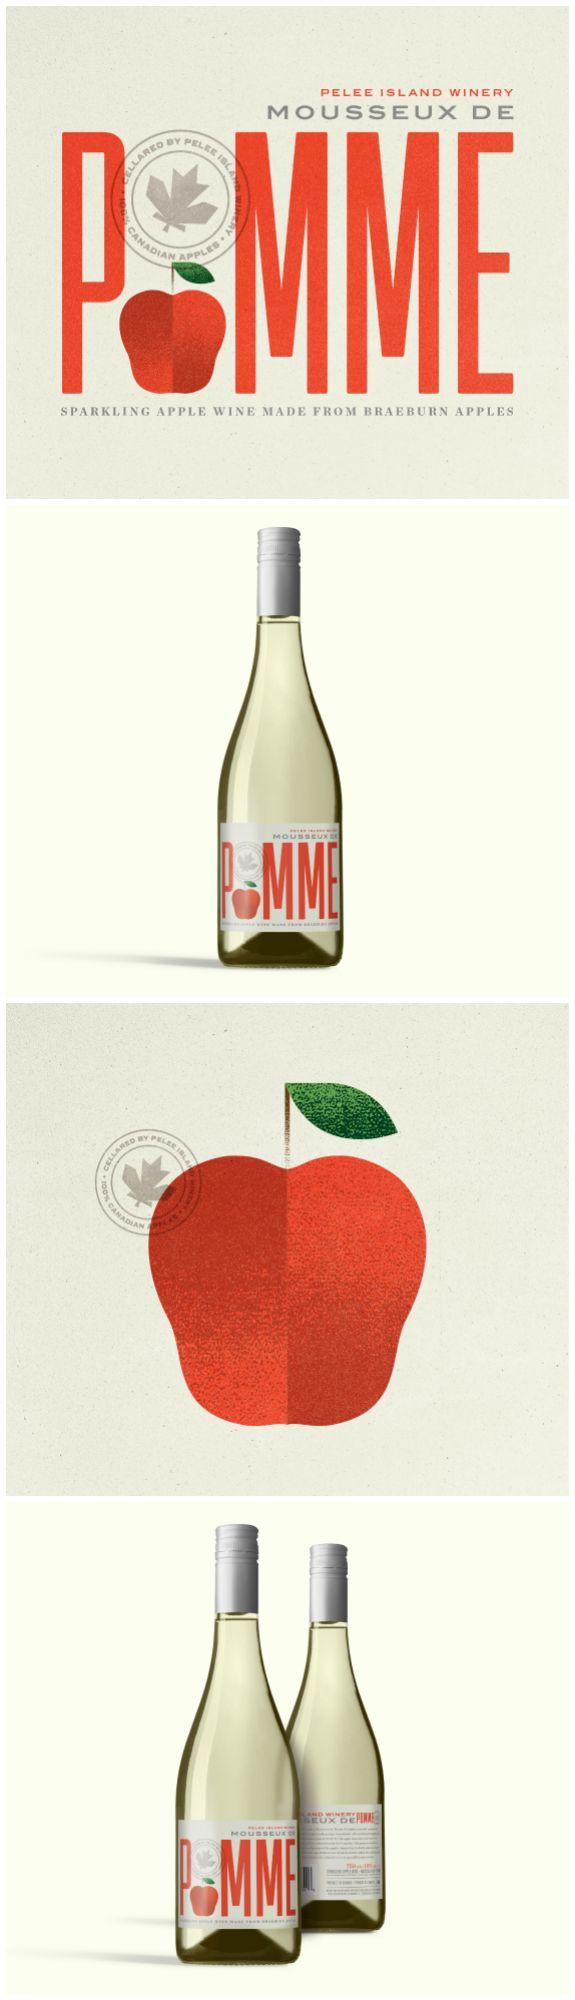 Label Design And Illustration For Winery S First Ever Sparkling Apple Cider World Brand Design Fruit Packaging Fruit Juice Recipes New Fruit